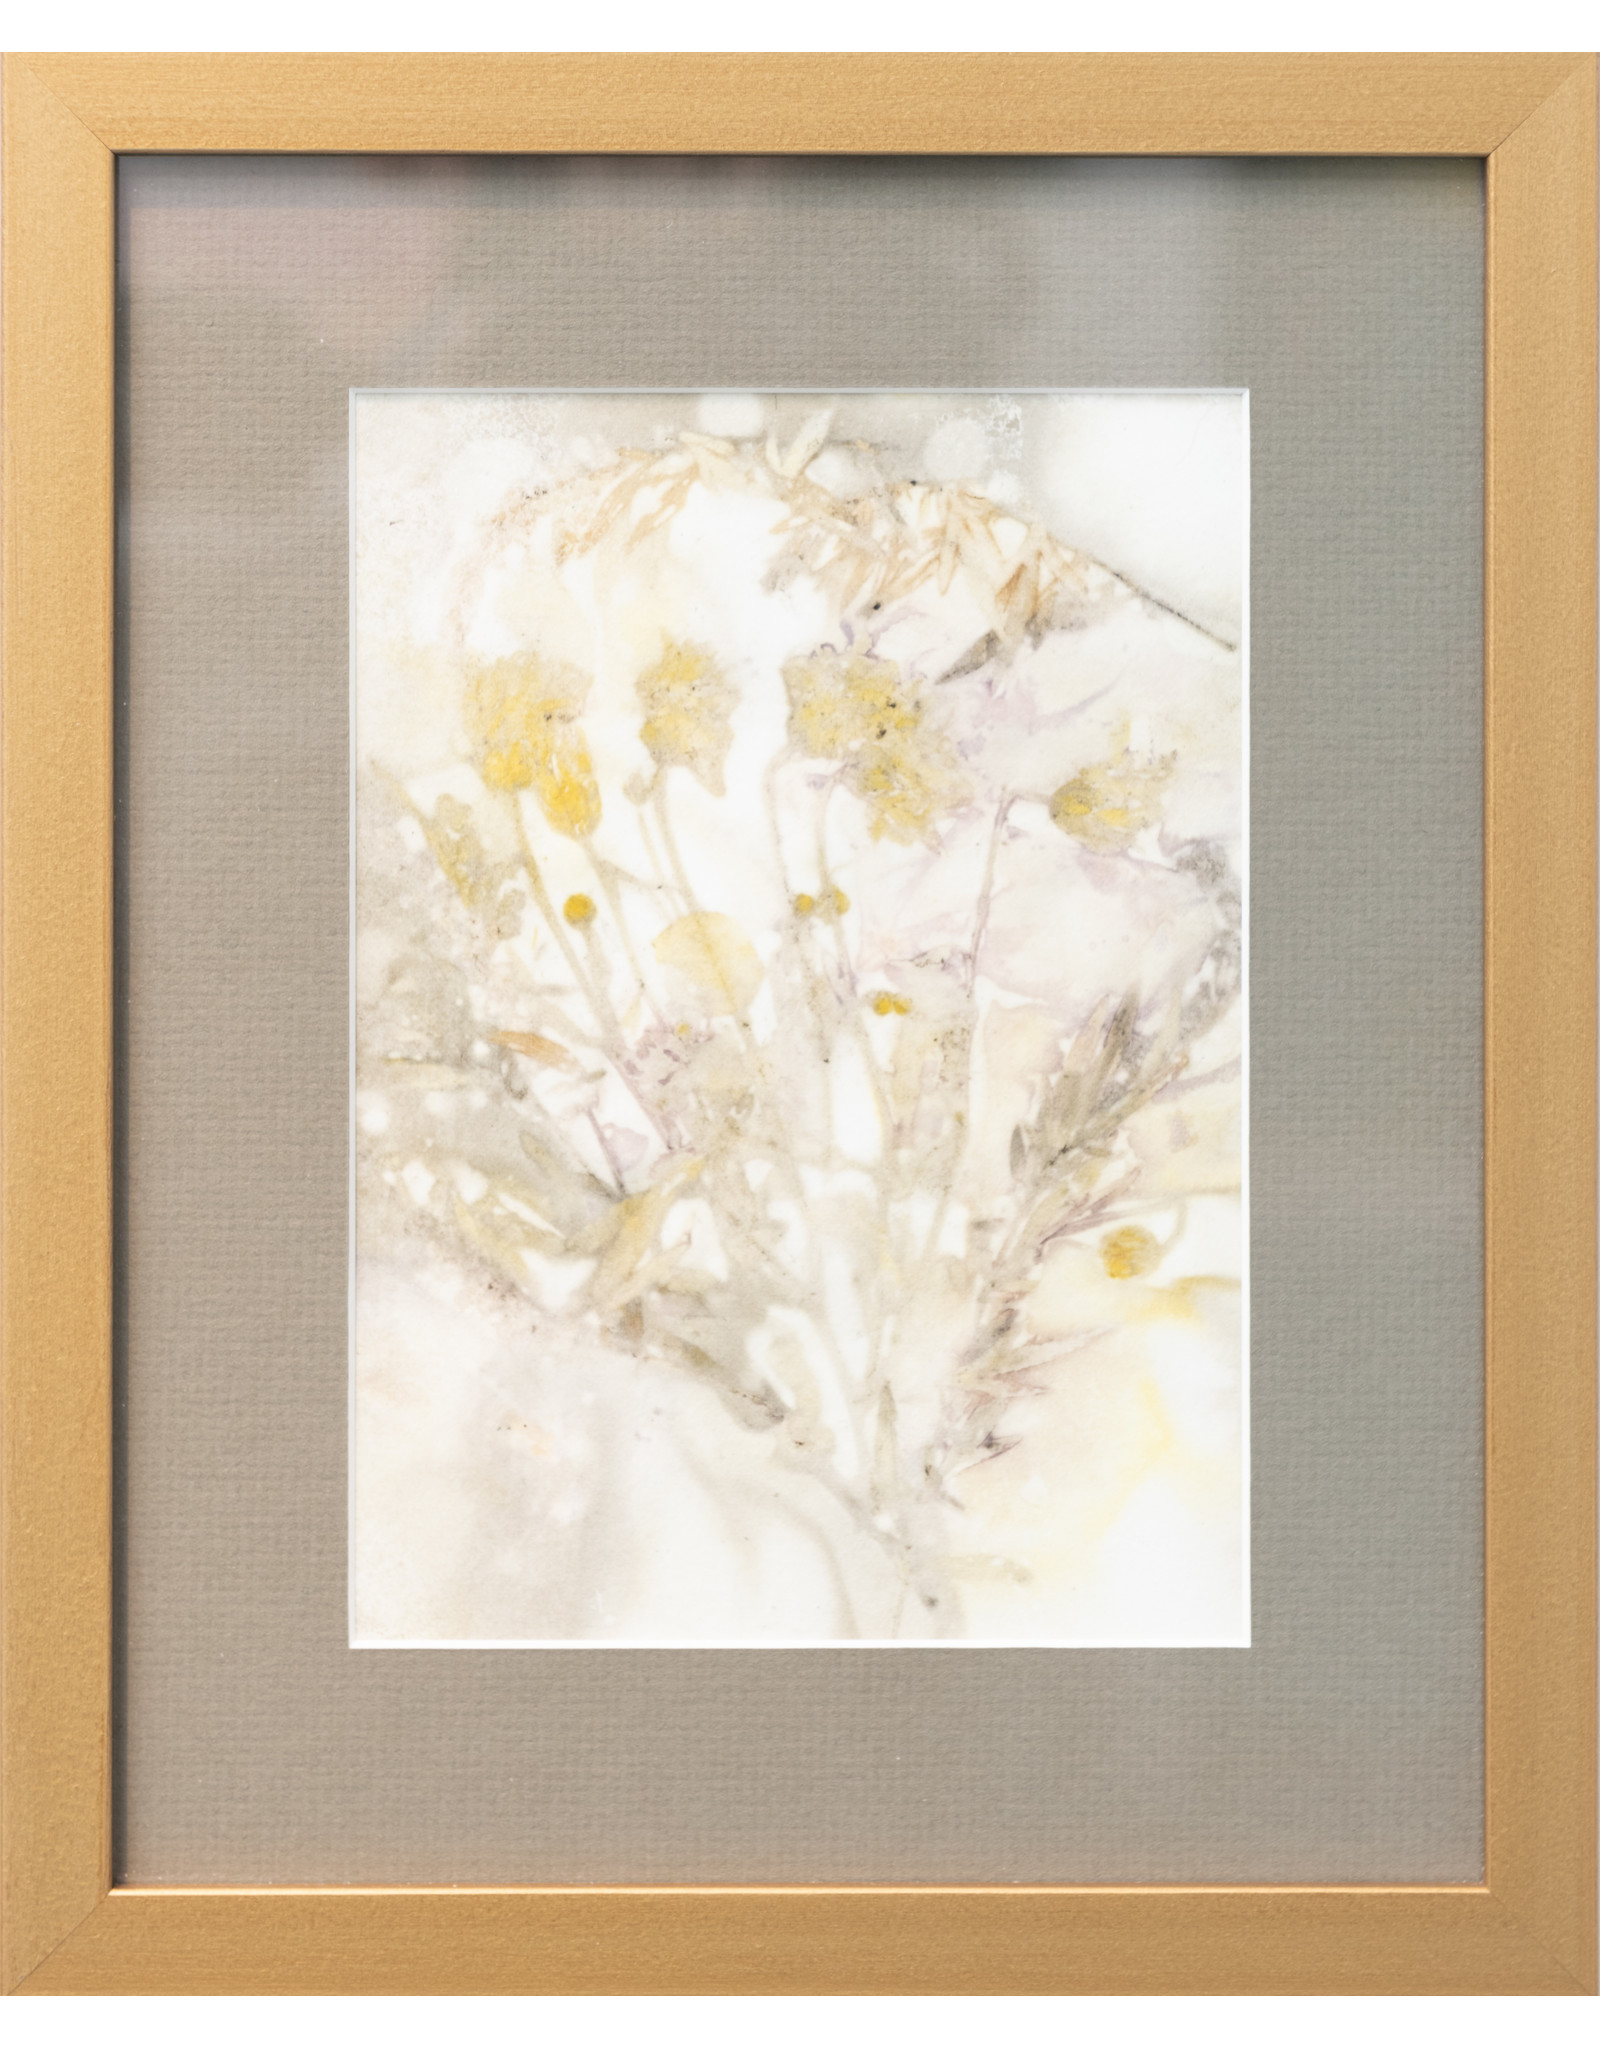 Kathleen Bunin Framed Botanical Prints (8x10) by Kathleen Bunin